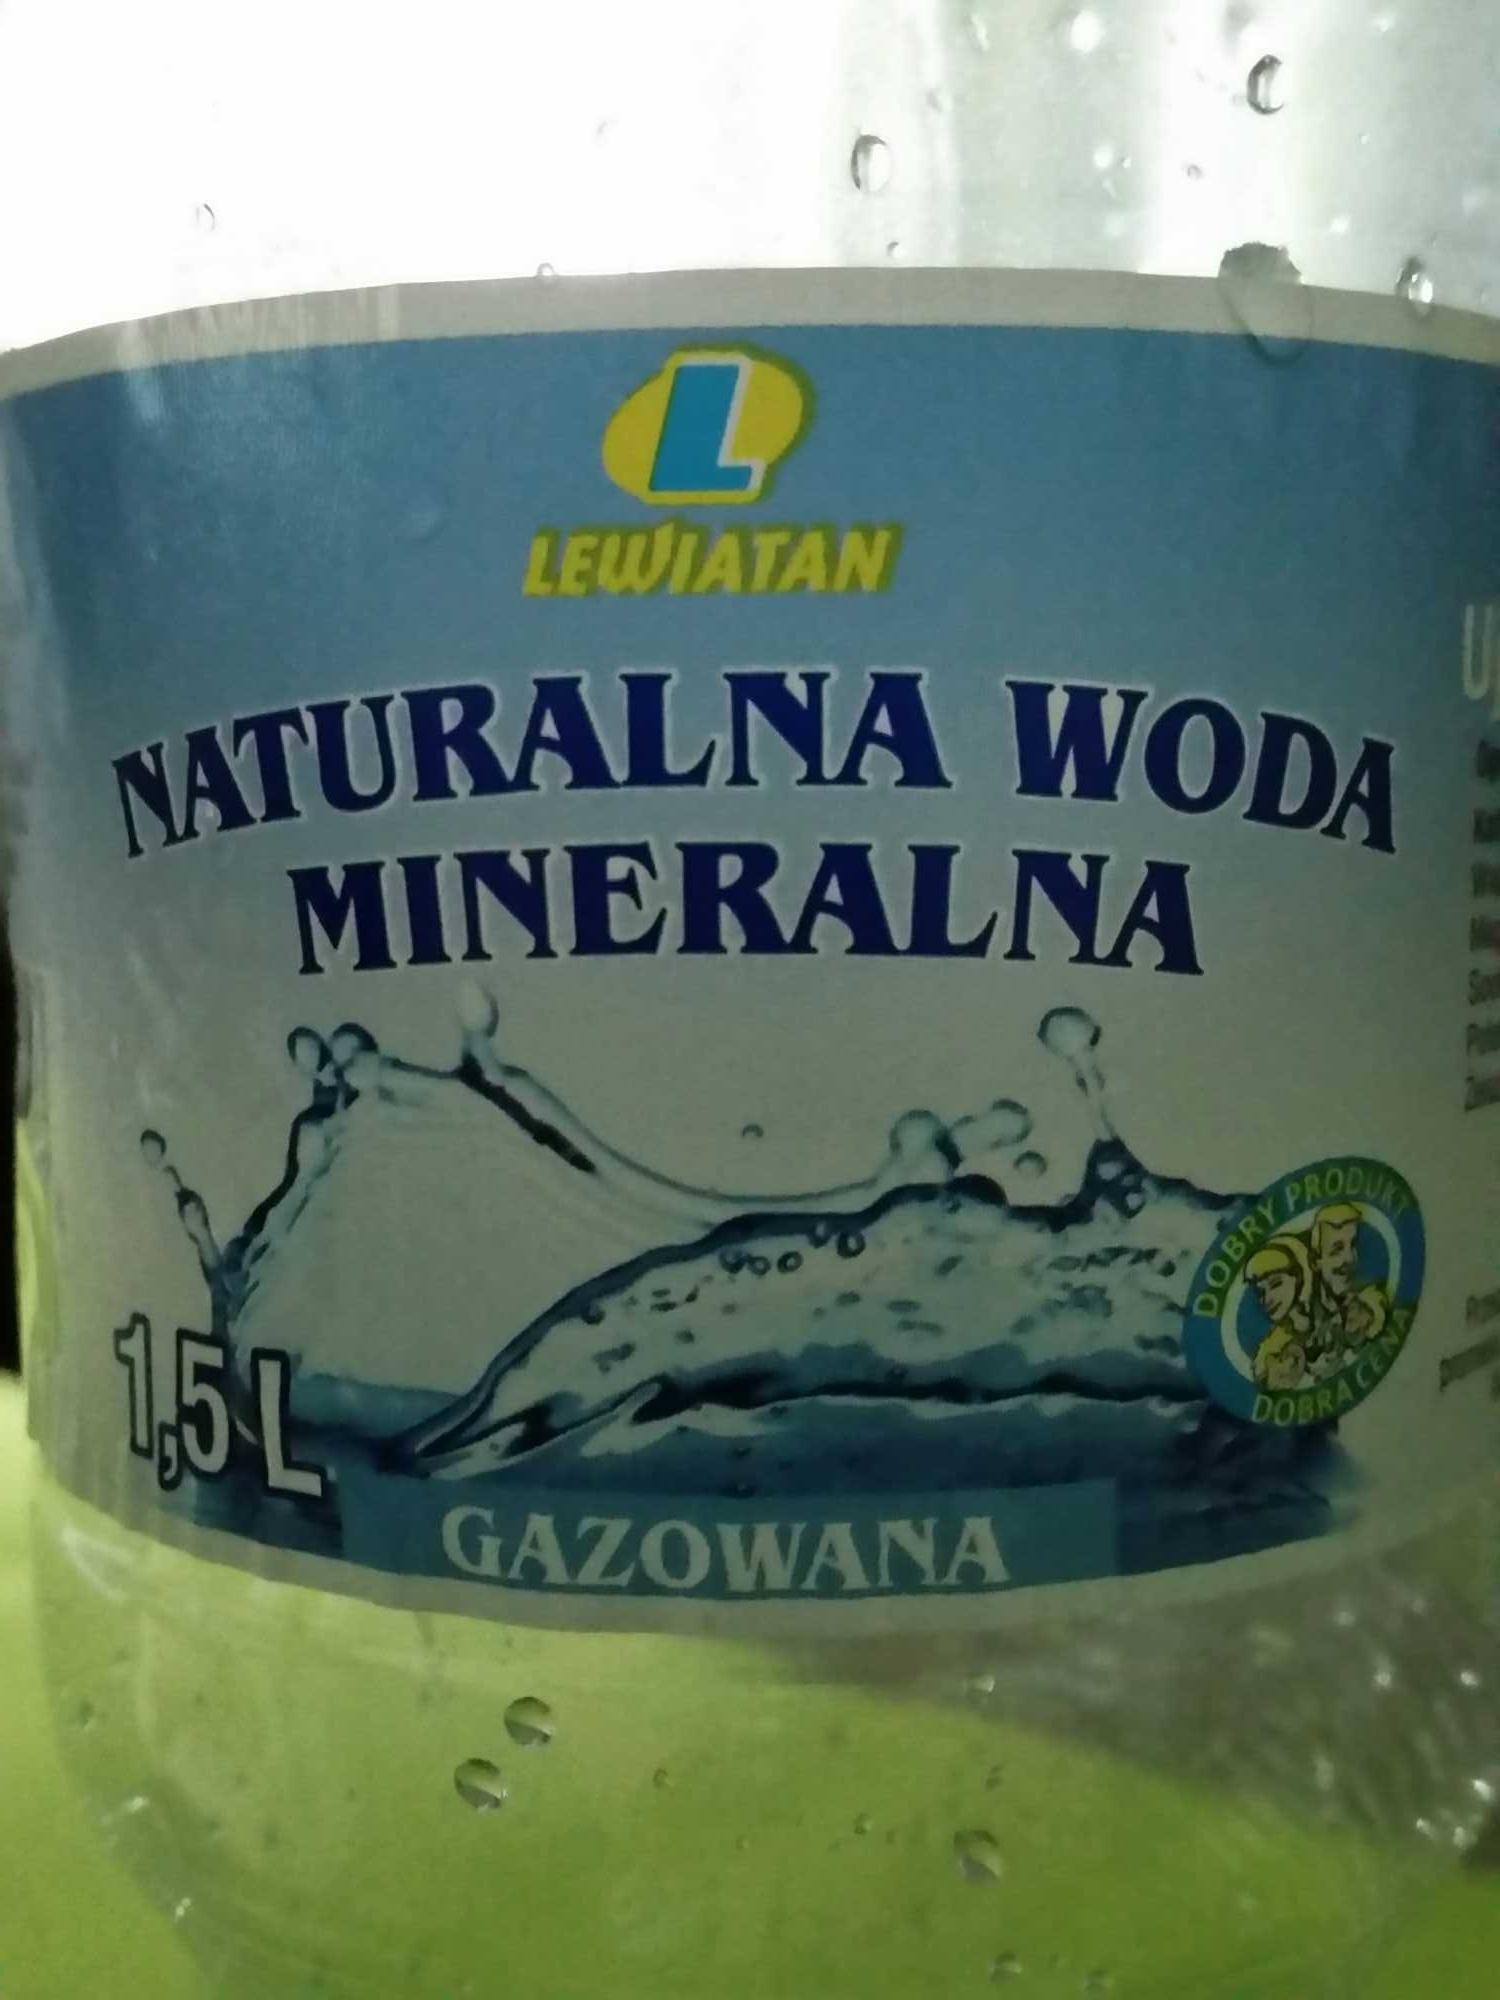 Naturalna Woda Mineralna - Product - en